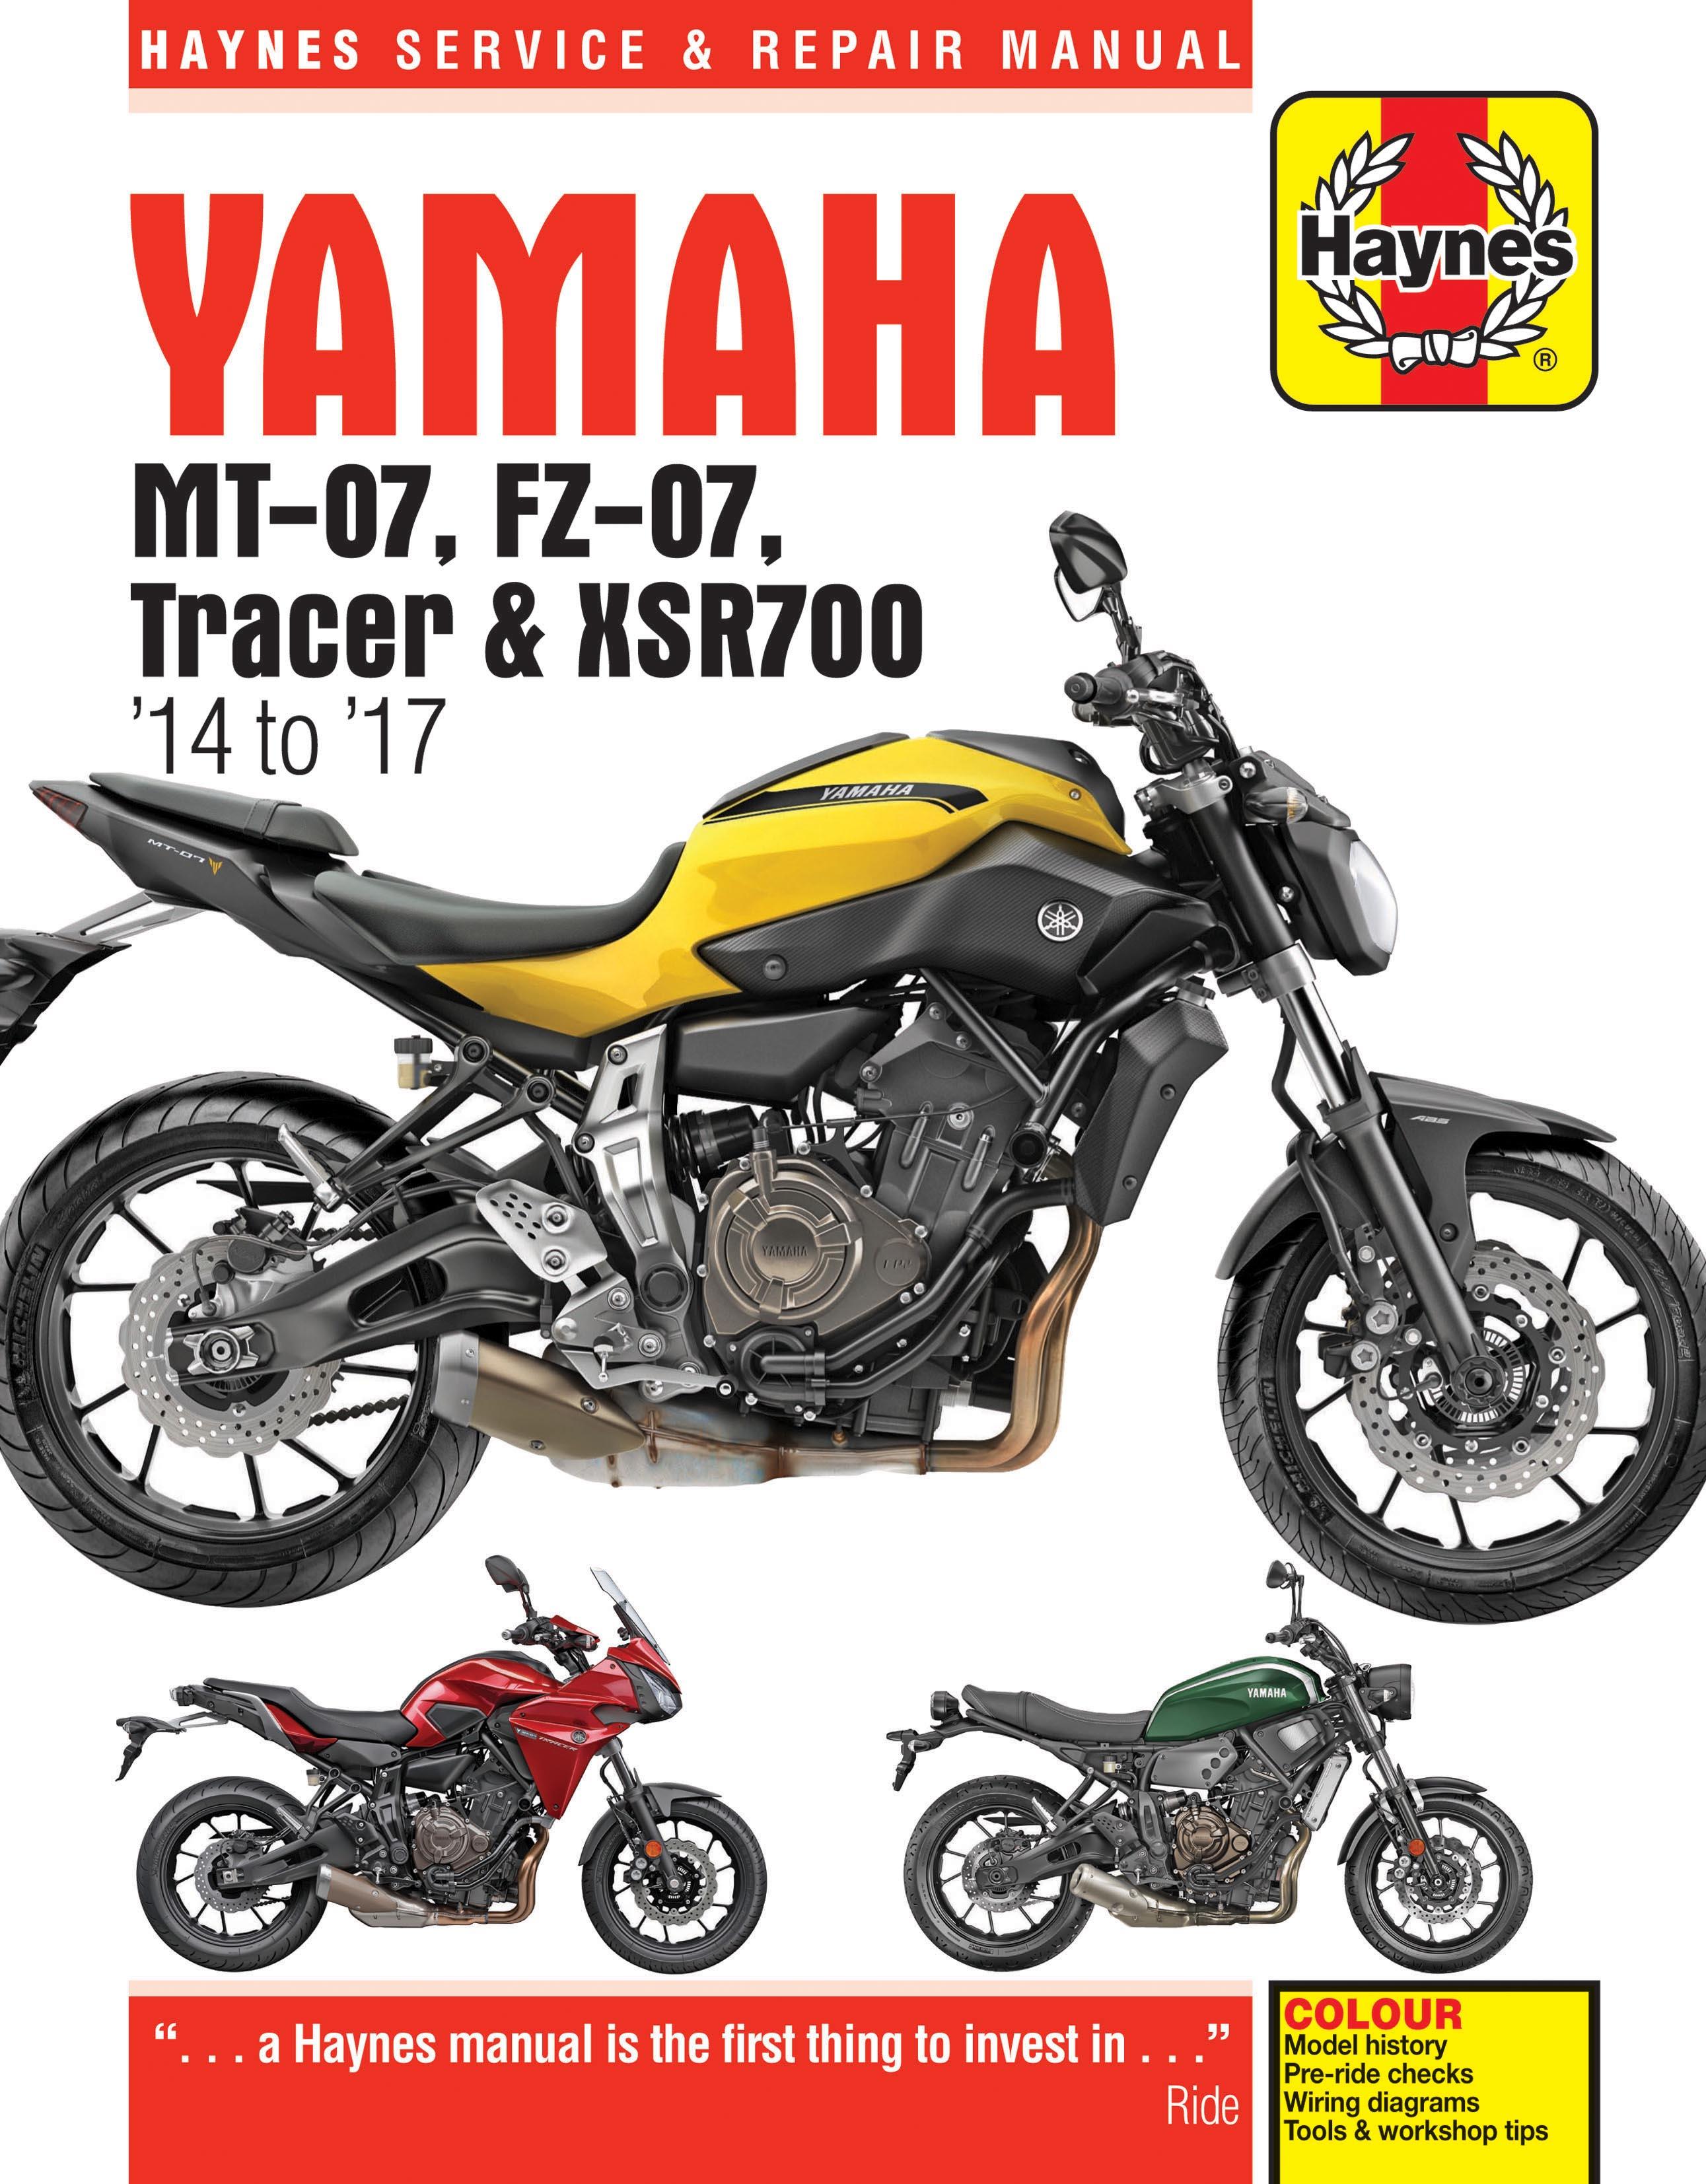 Yamaha MT-07,  FZ-07,  MT-07TR Tracer & XSR700 (14-17) Haynes Repair Manual